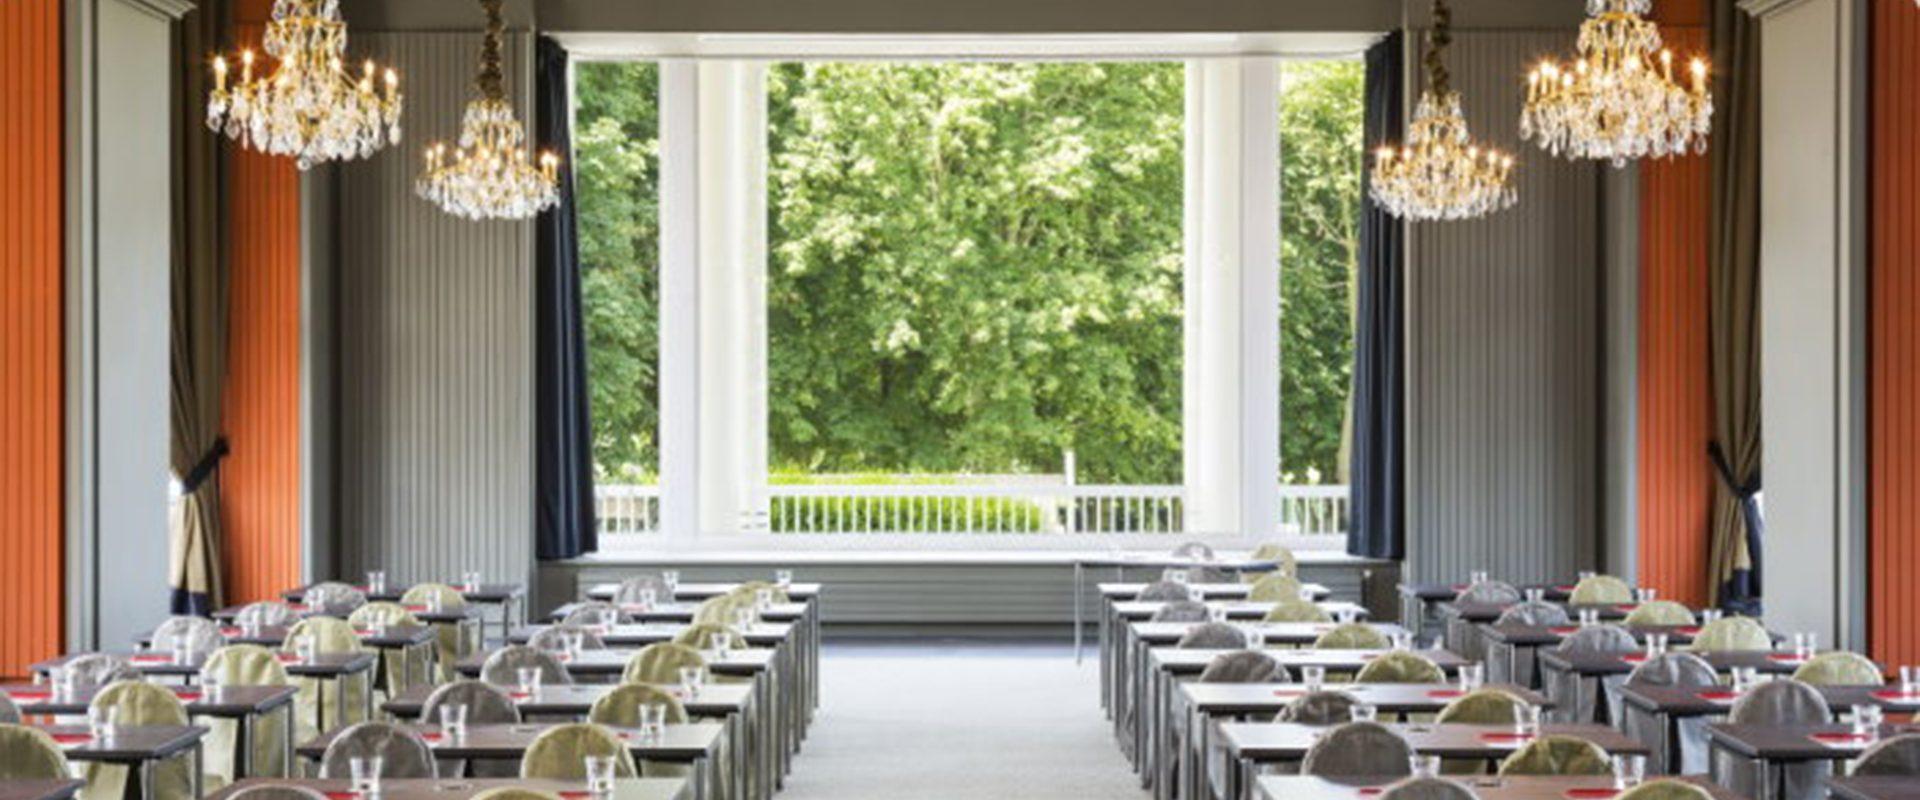 Deauville 4 - Top-DRH Deauville - Convention professionnelle - Ressources Humaines